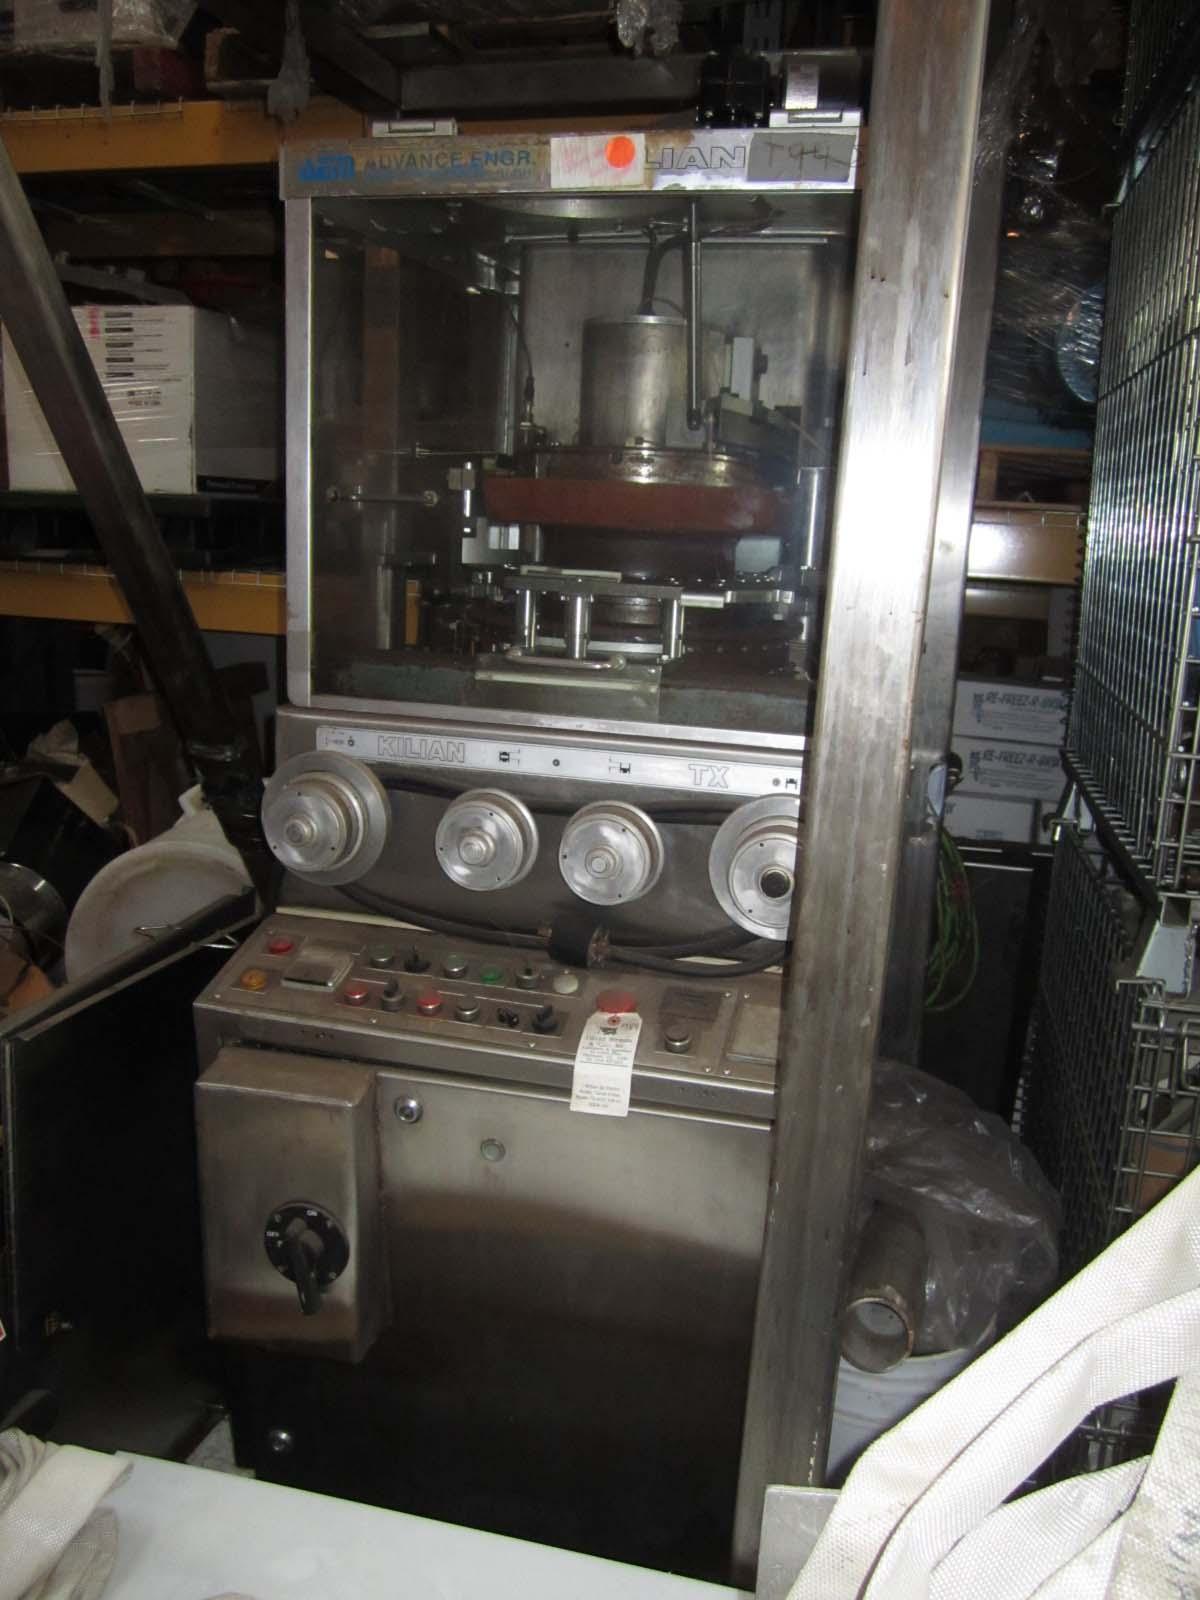 33 Station Killian Tablet Press